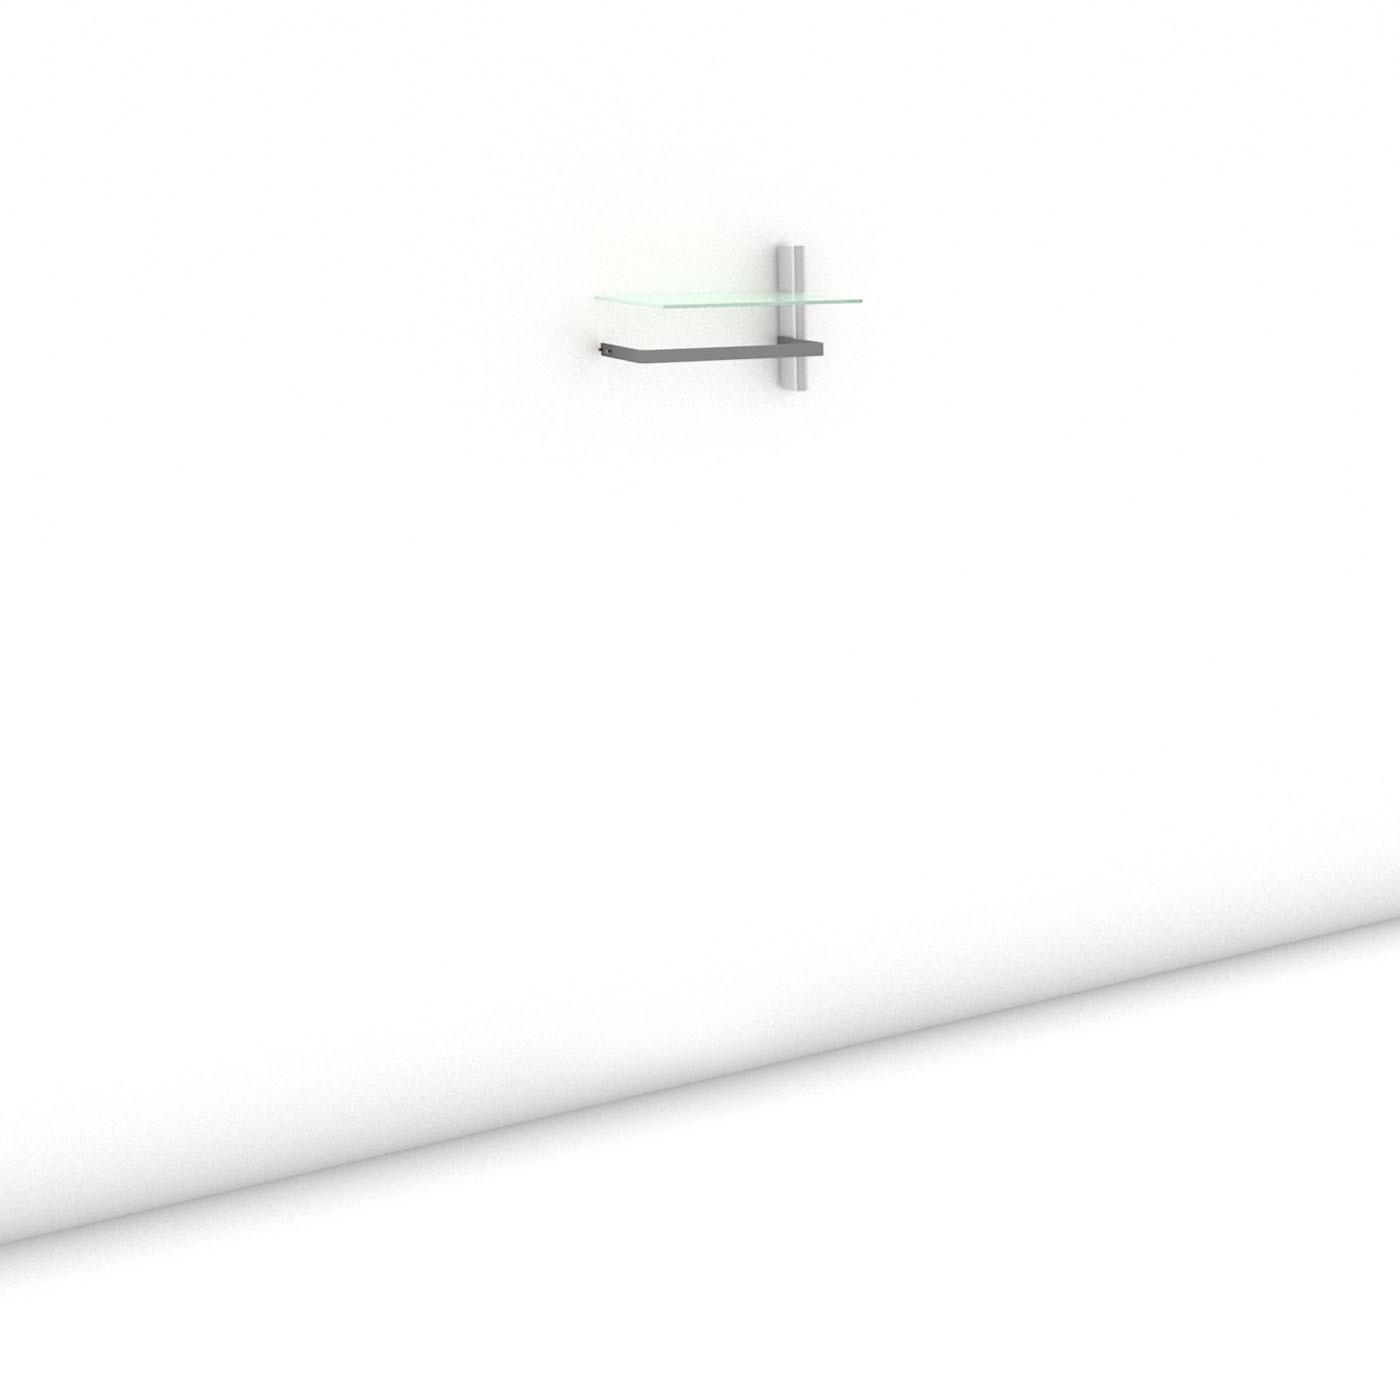 Garderobe - COAT-RACK - Comfort (S) 51 - Anbauelement - Maß: 51 x 35,2 x 45 cm (B x H x T)